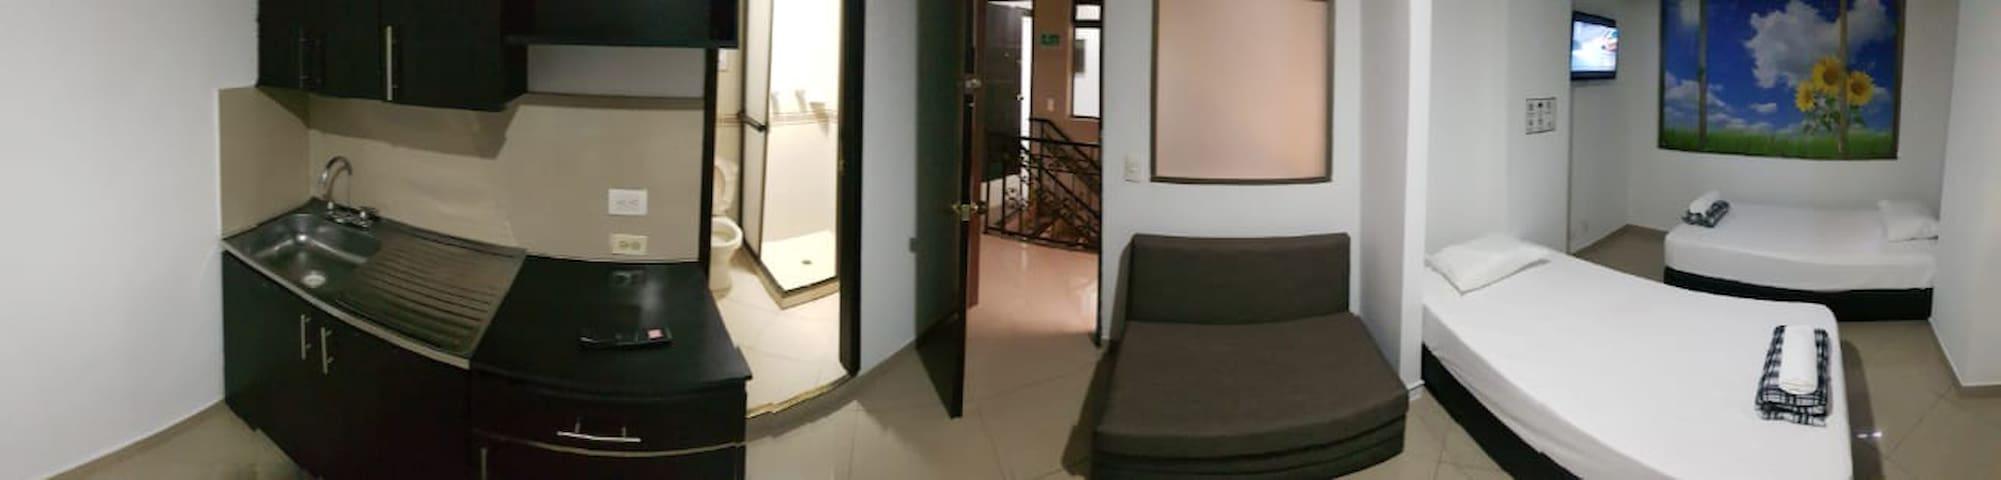 Apartamento amoblado Laureles 303 frente Unicentro